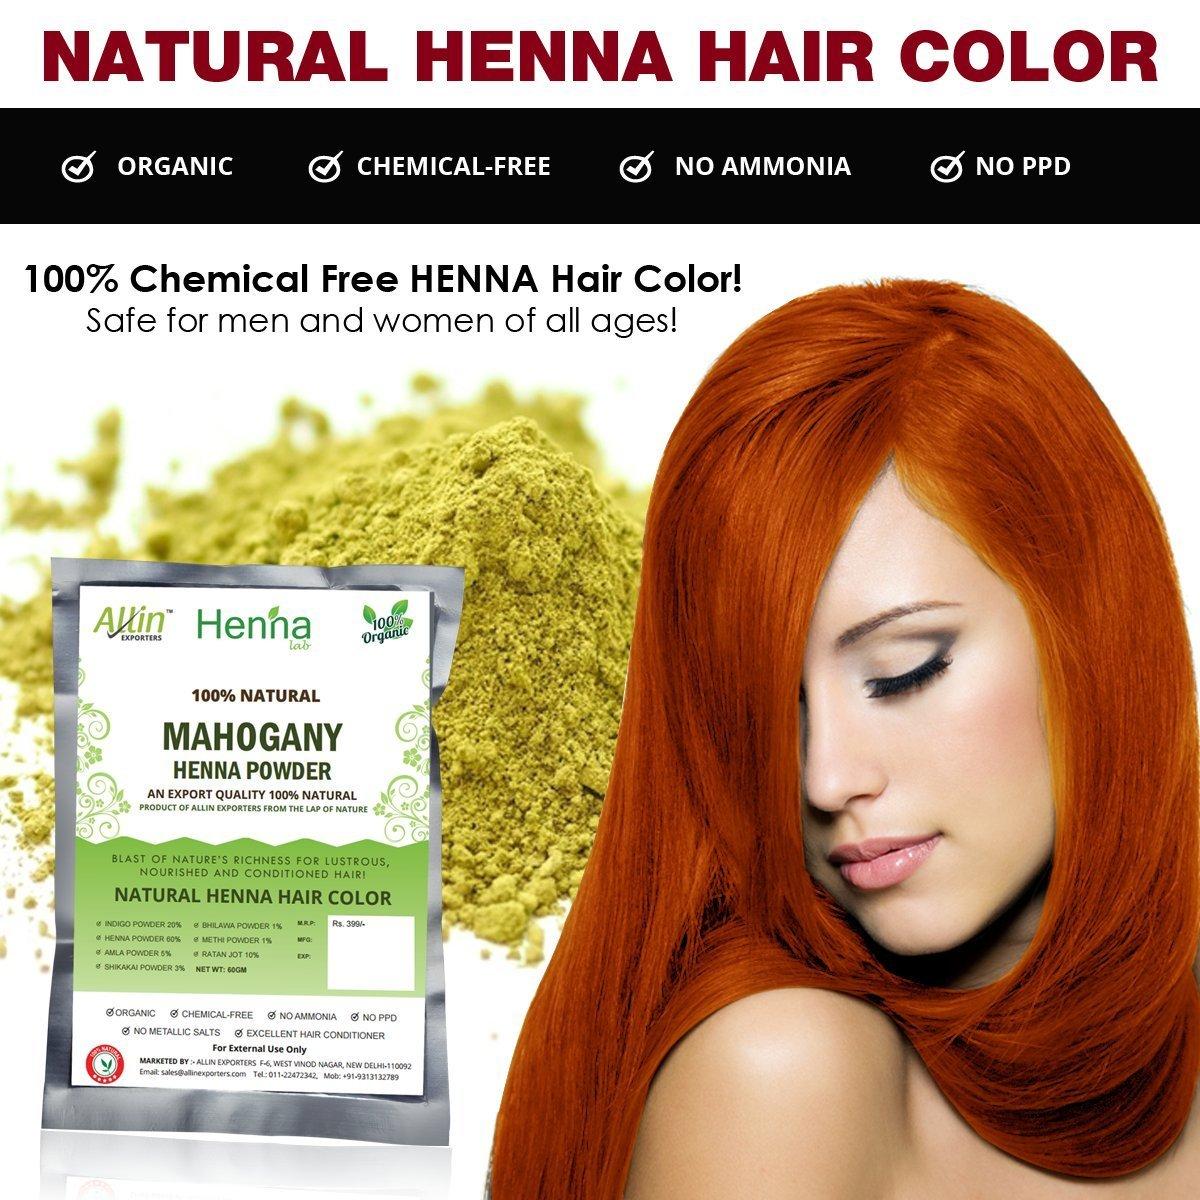 Buy Mahogany Henna Hair Color 100 Organic And Chemical Free Henna